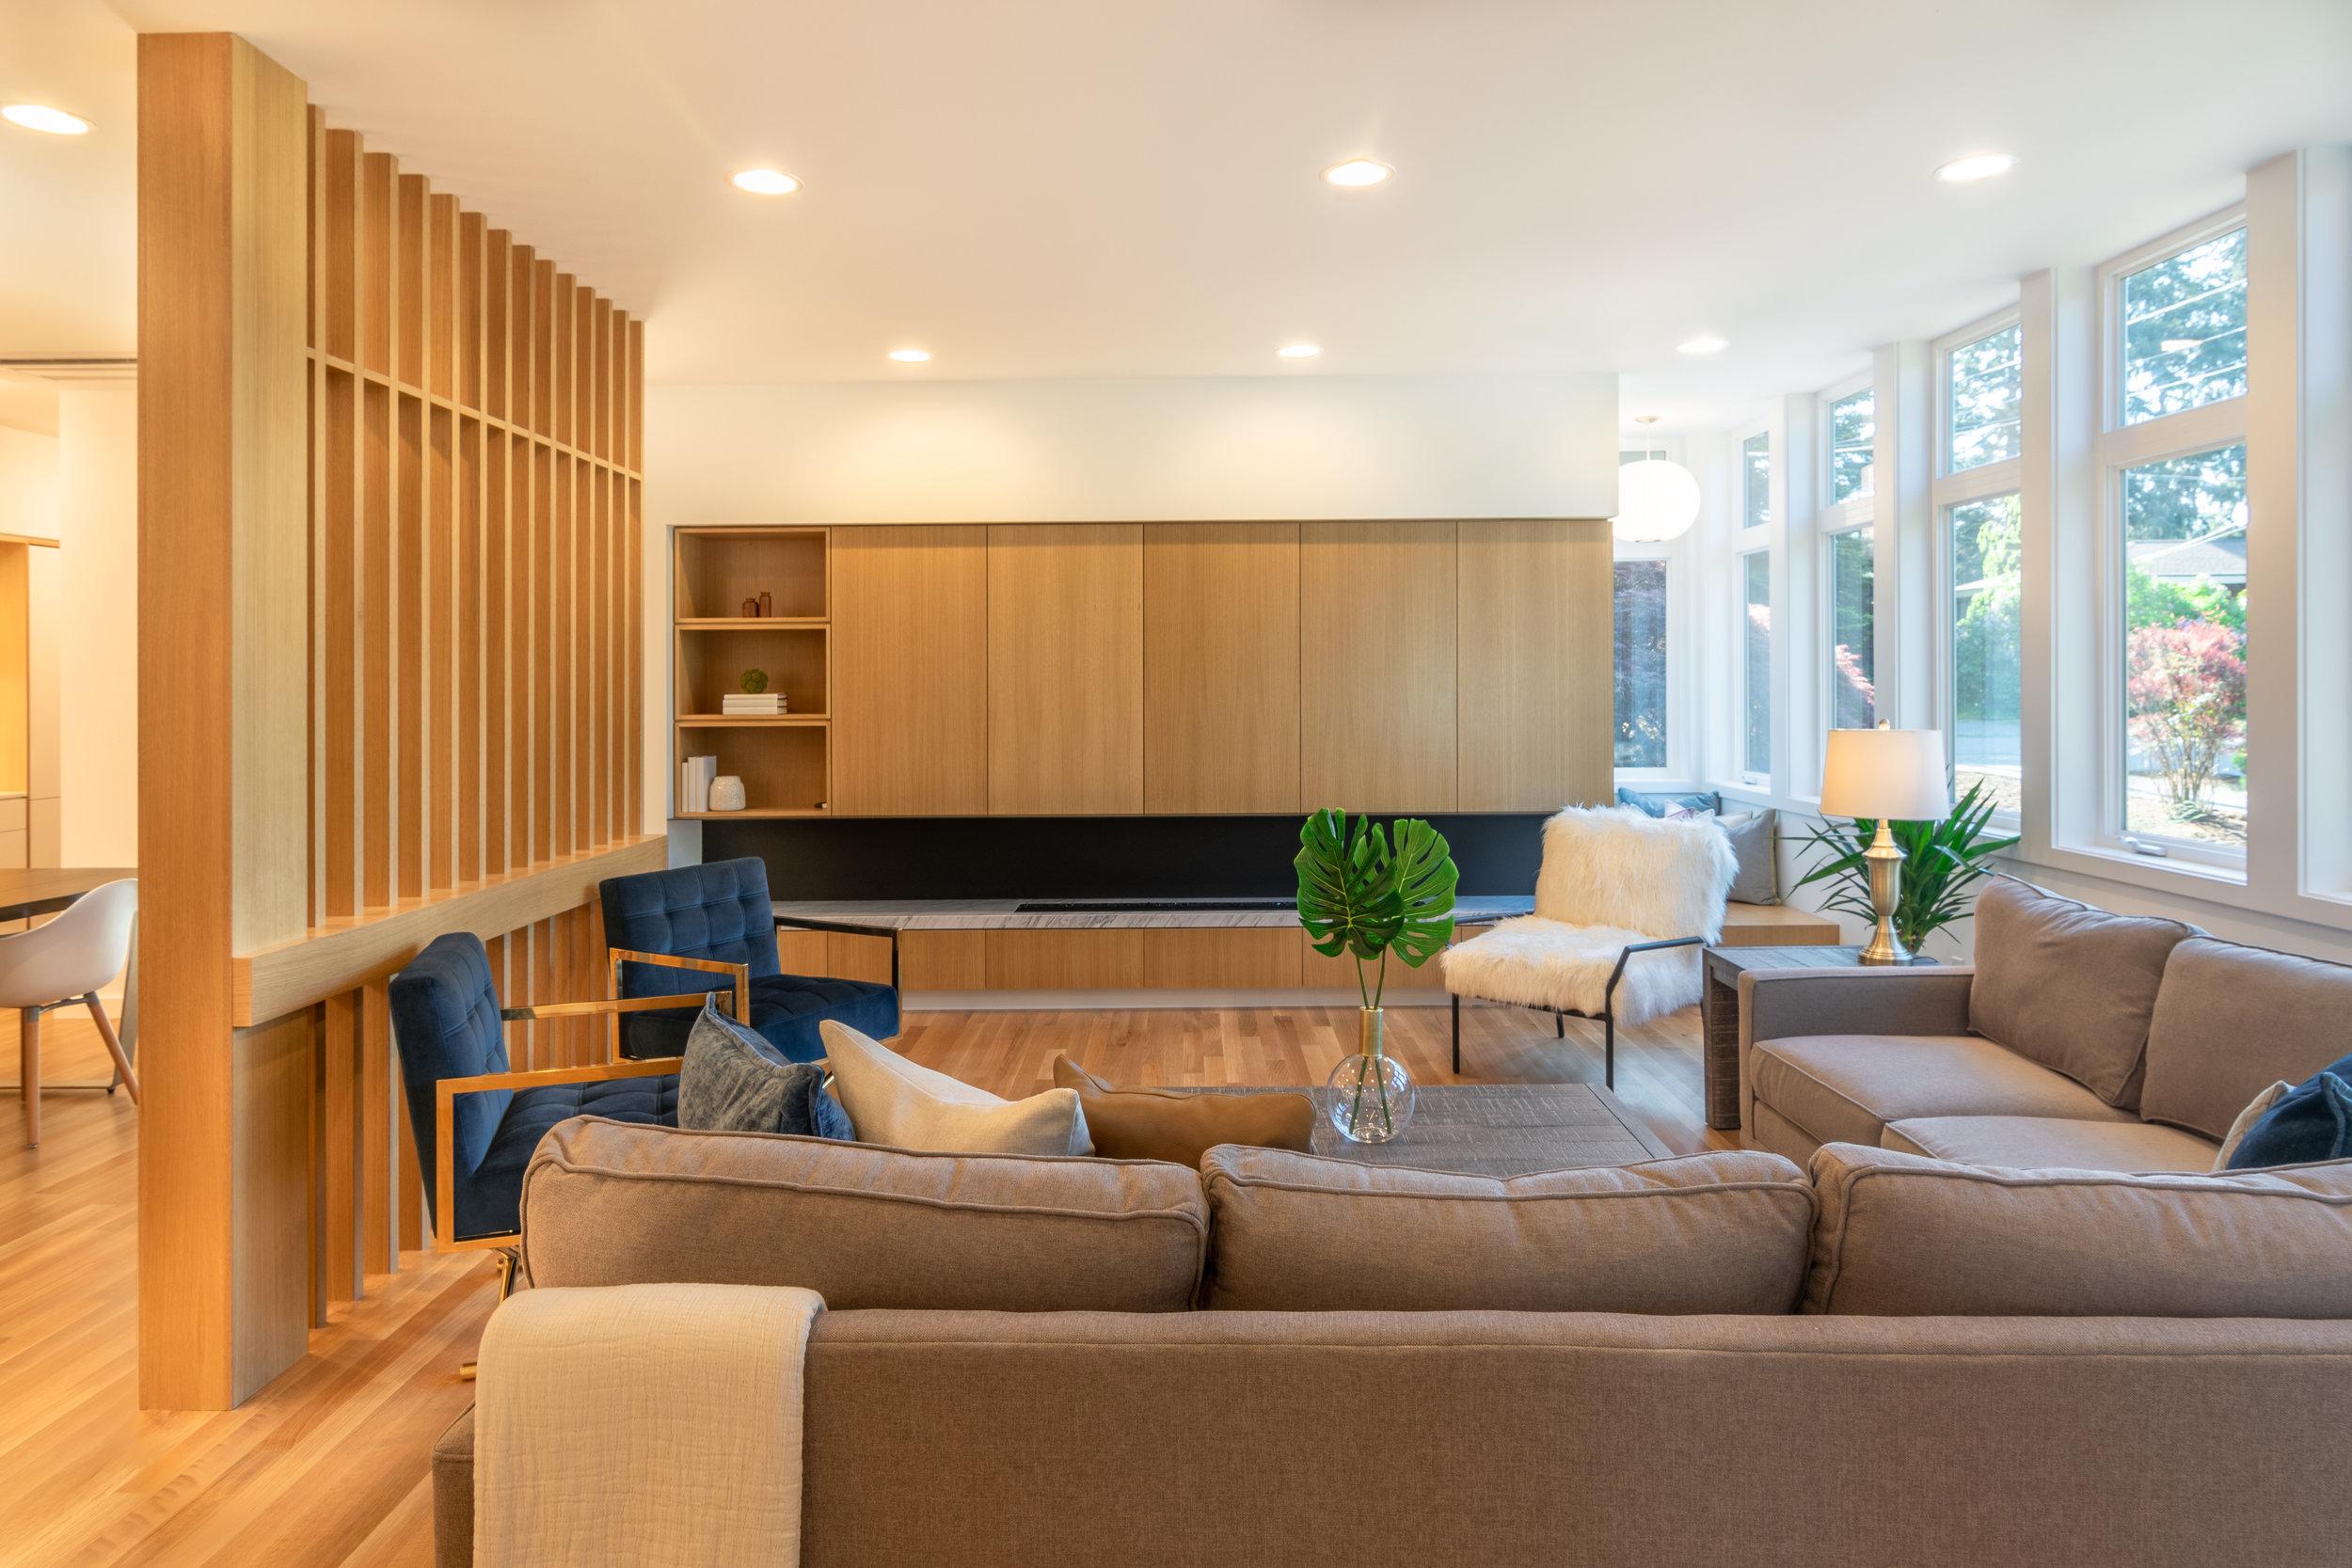 Ravenna Garden House Living Room and Reading Nook